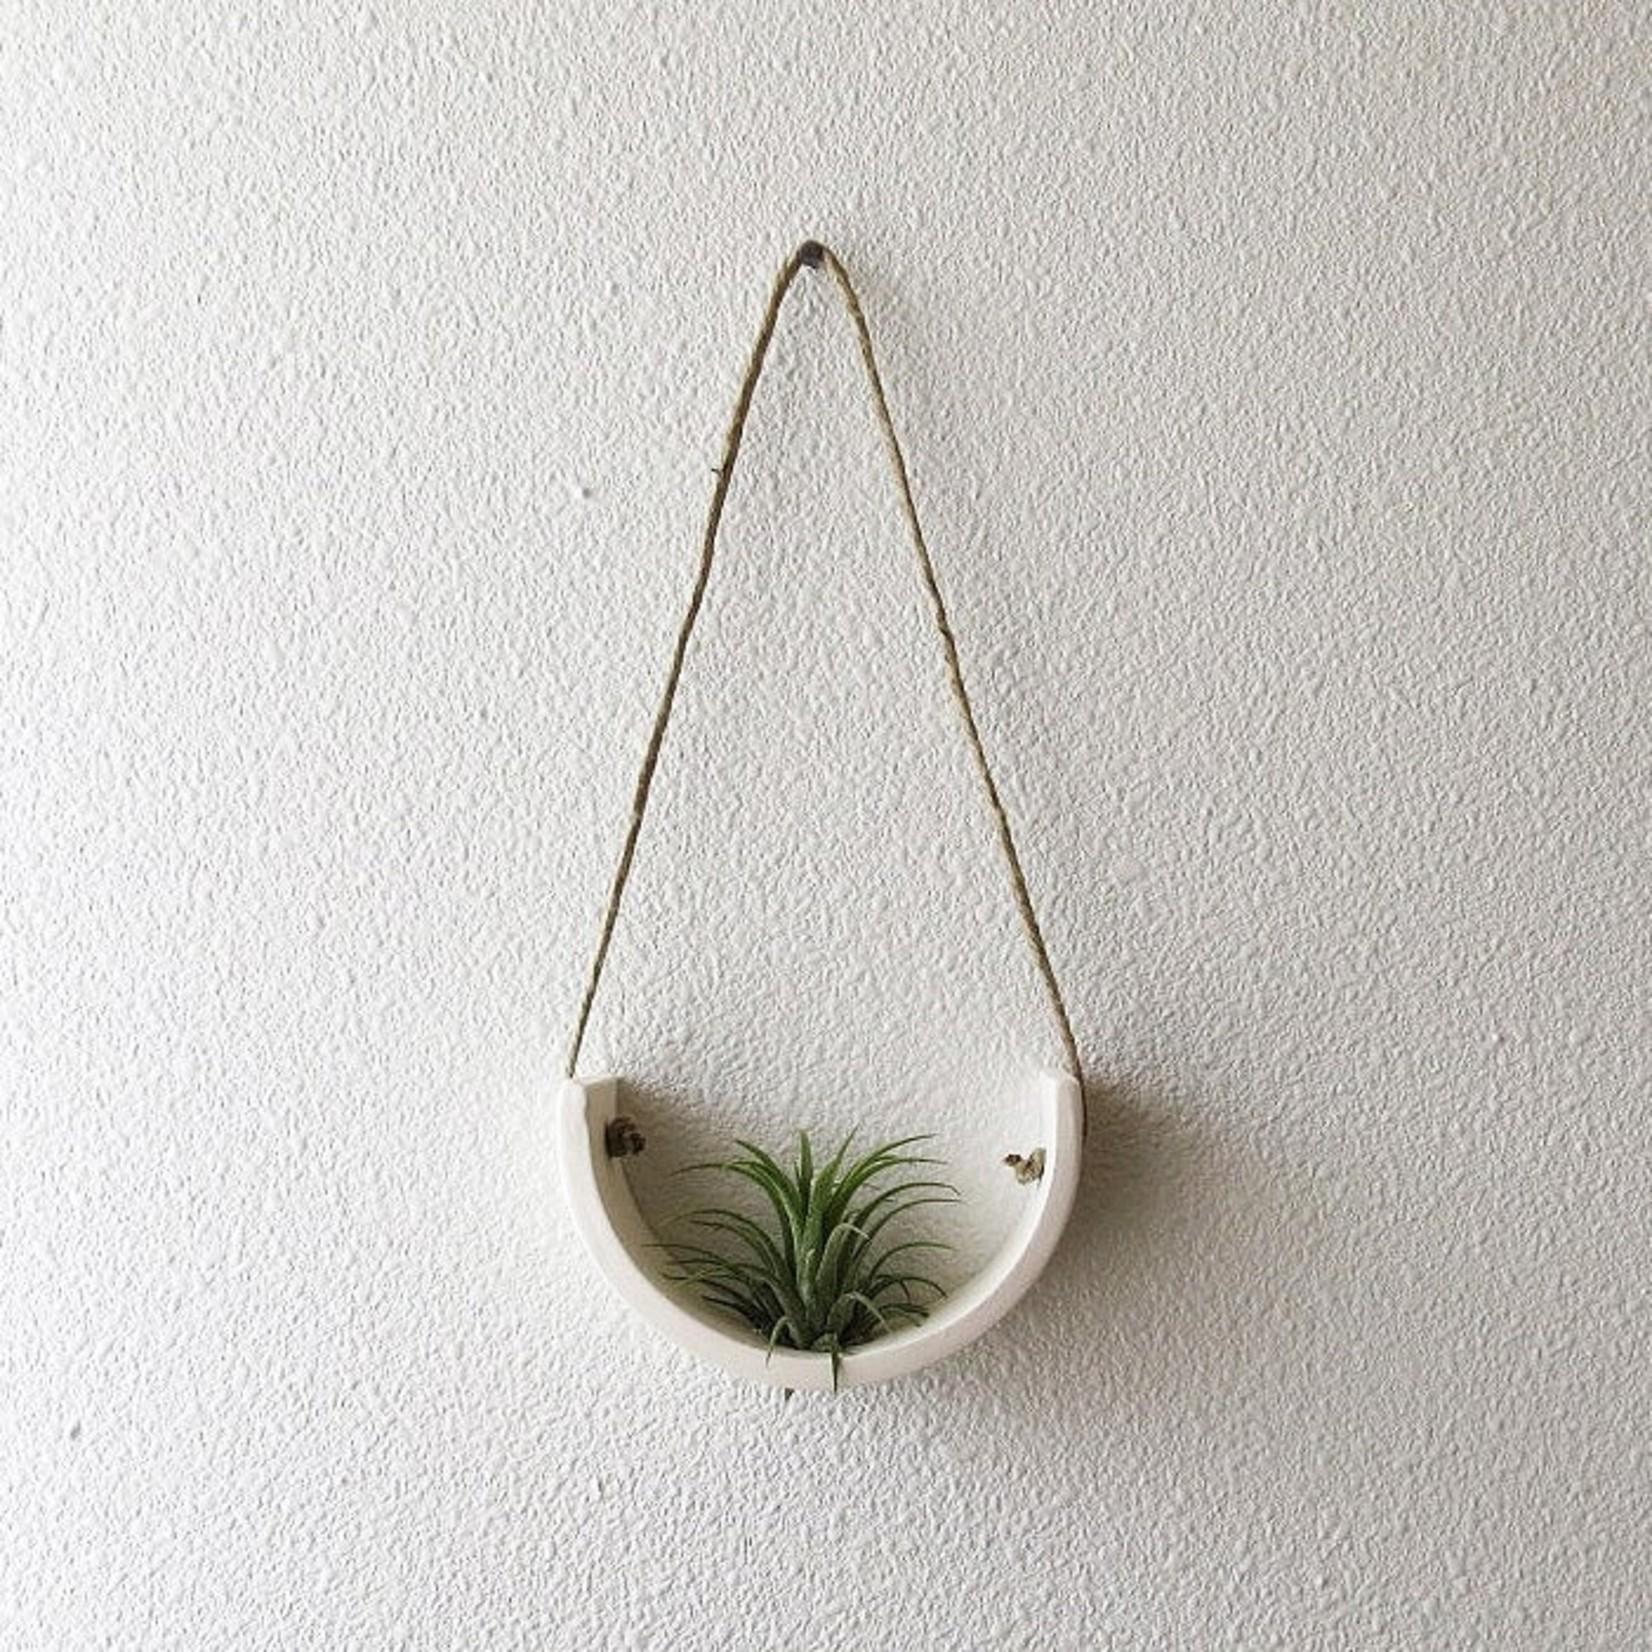 Mudpuppy Mudpuppy Hanging Planter White Earthenware Small